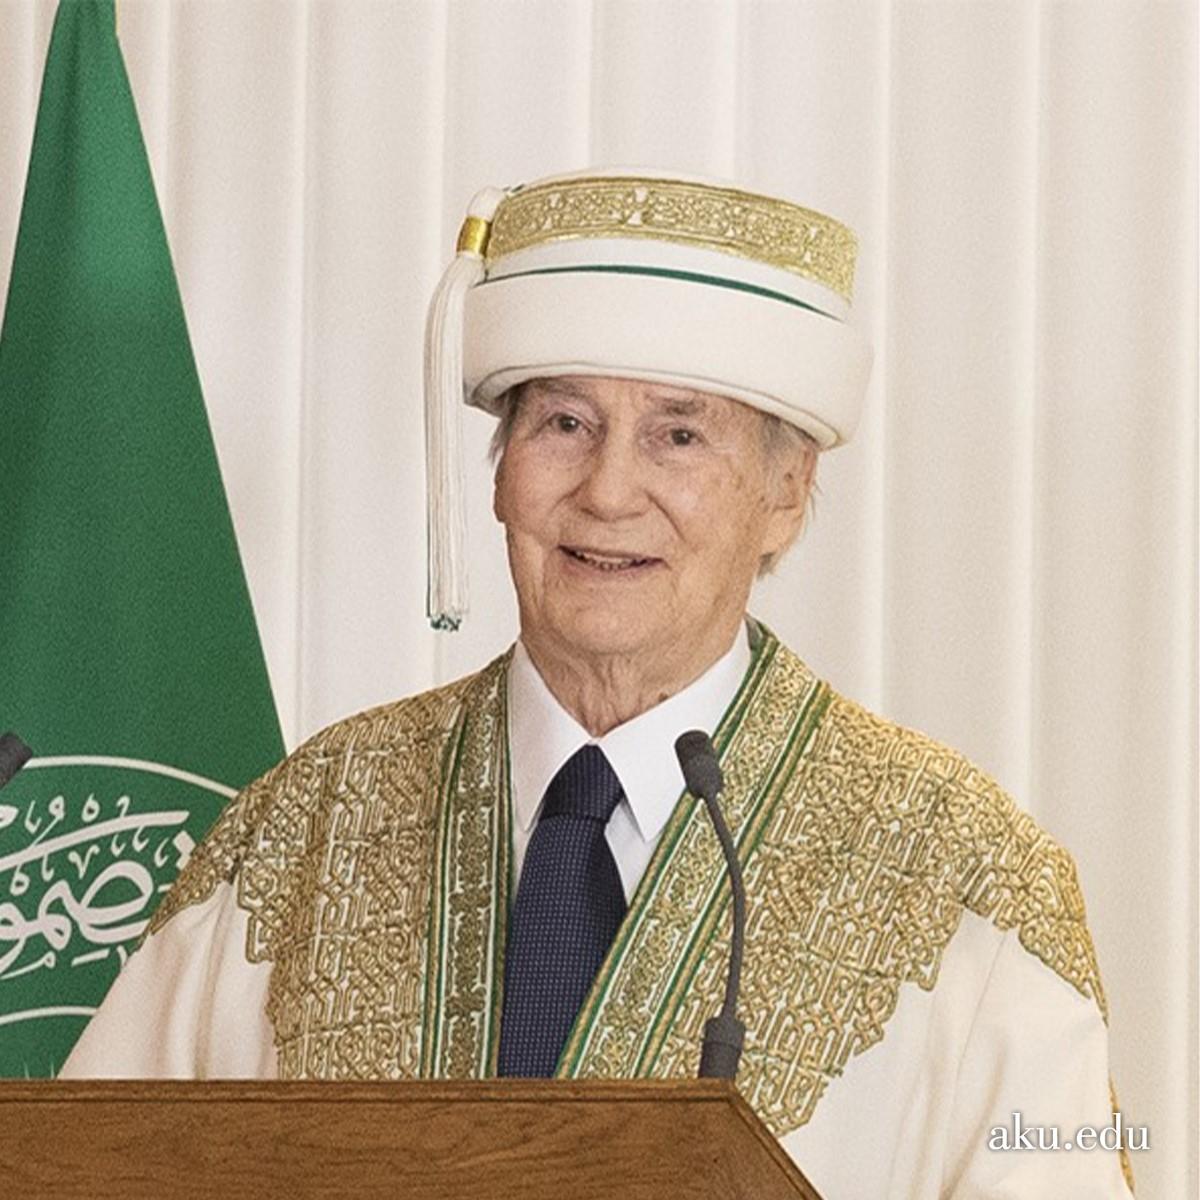 Mawlana Hazar Imam, His Highness the Aga Khan, Barakah, a website dedicated to the Aga Khan